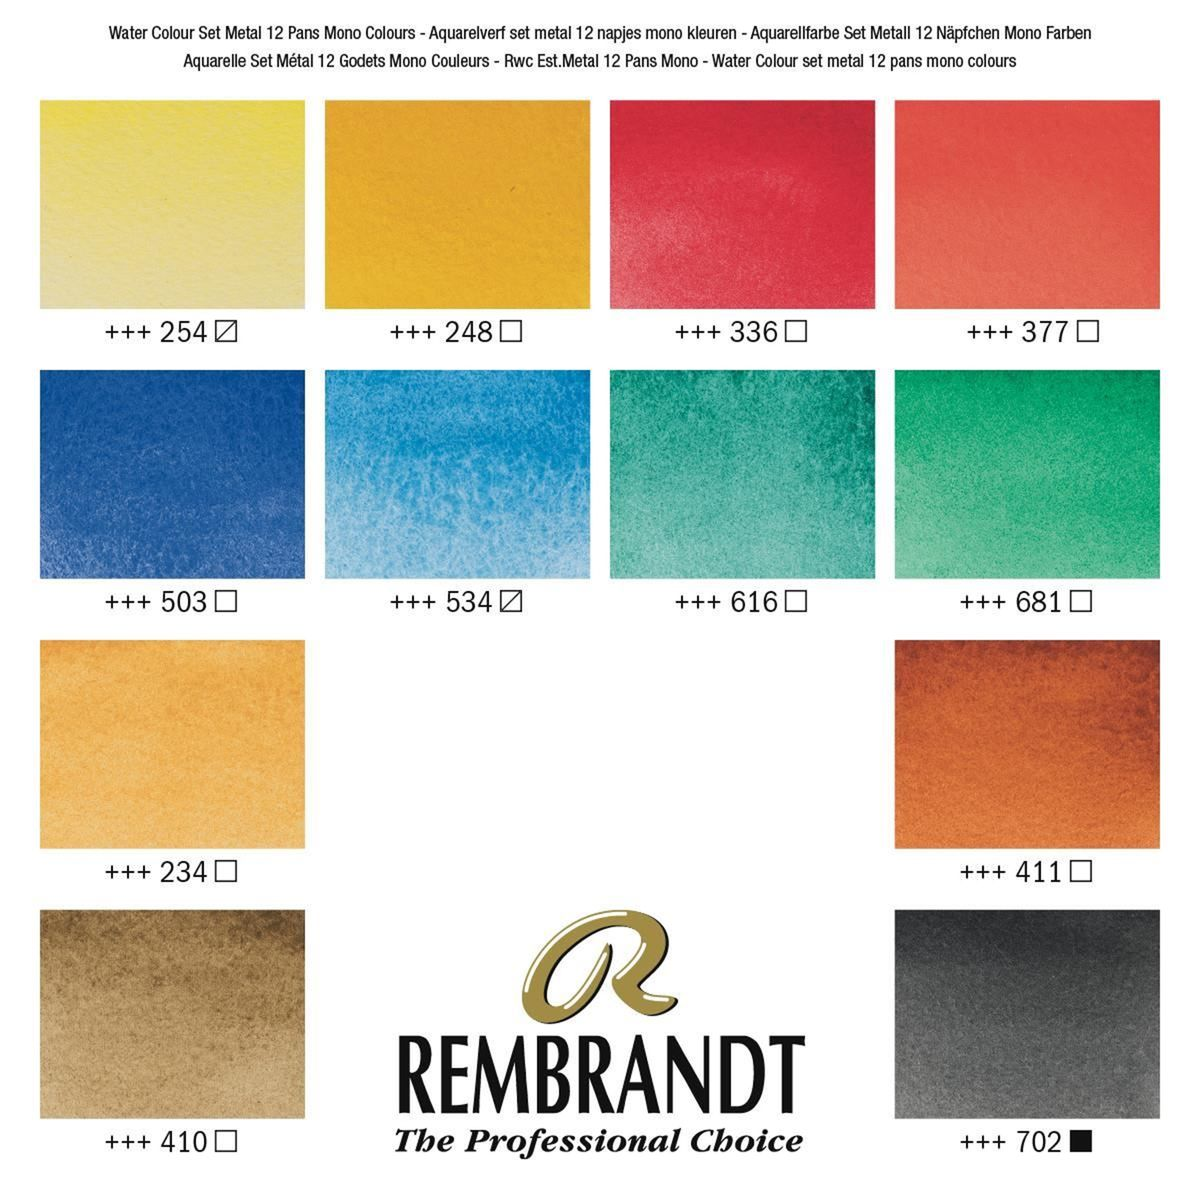 Aquarela Rembrandt Profissional Estojo Metalico 12